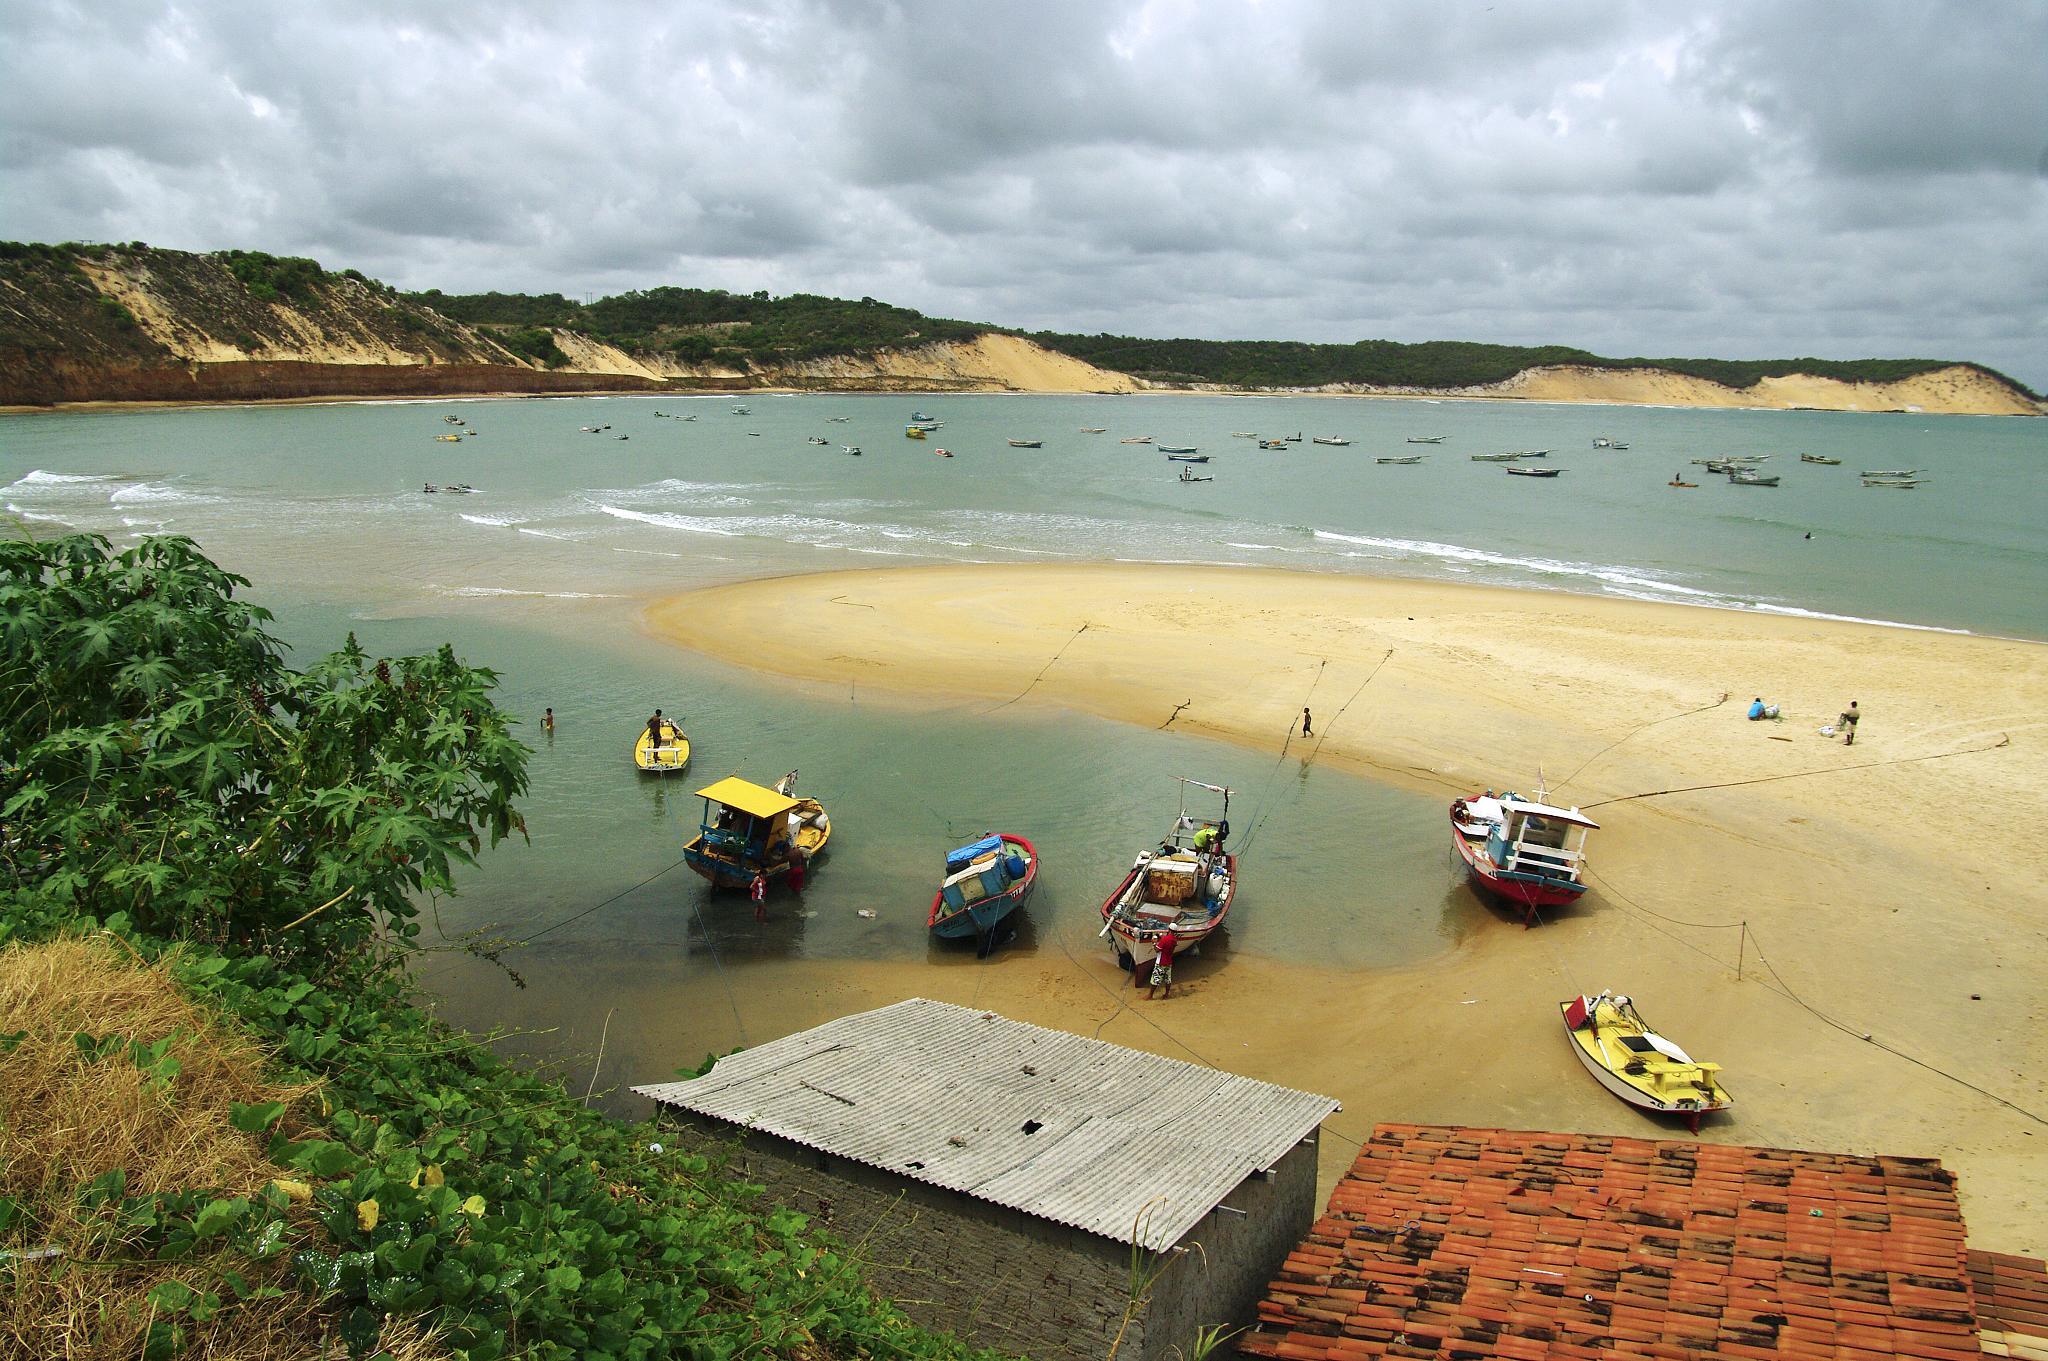 Baía Formosa Rio Grande do Norte fonte: upload.wikimedia.org